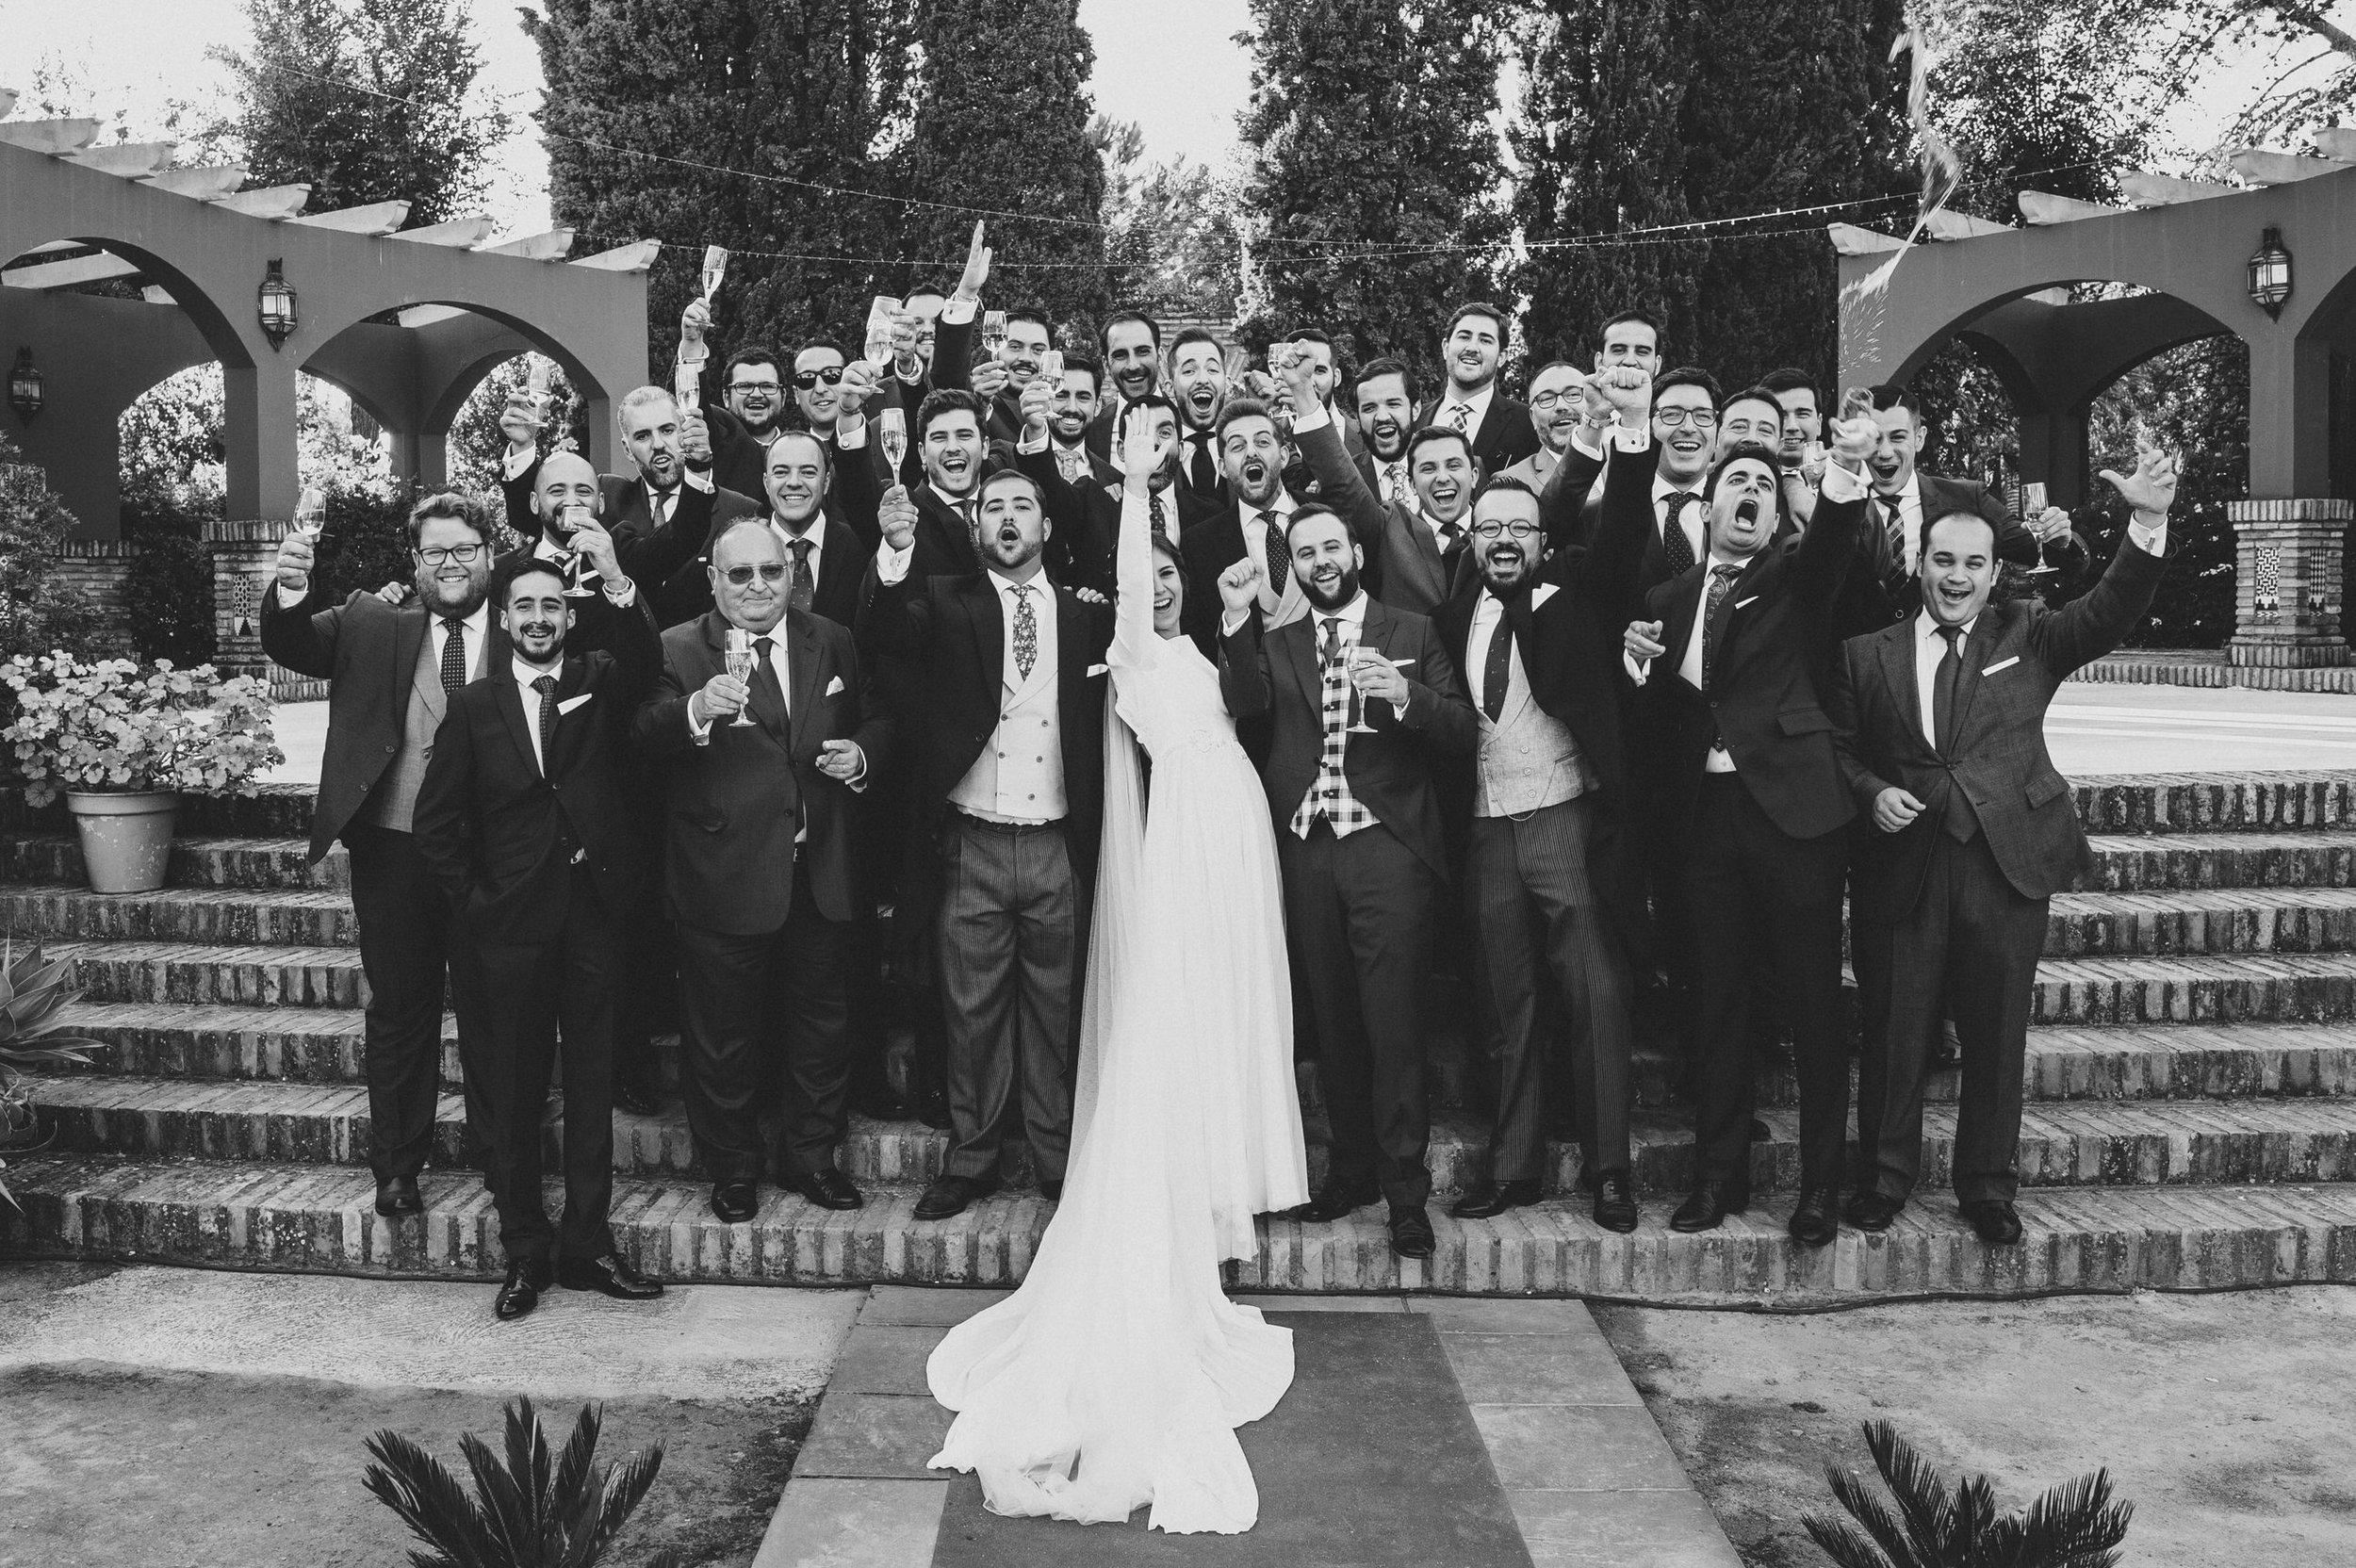 andres+amarillo+fotografo+boda+sevilla+santa+maria+de+la+blanca+al+yamanah (18).JPG